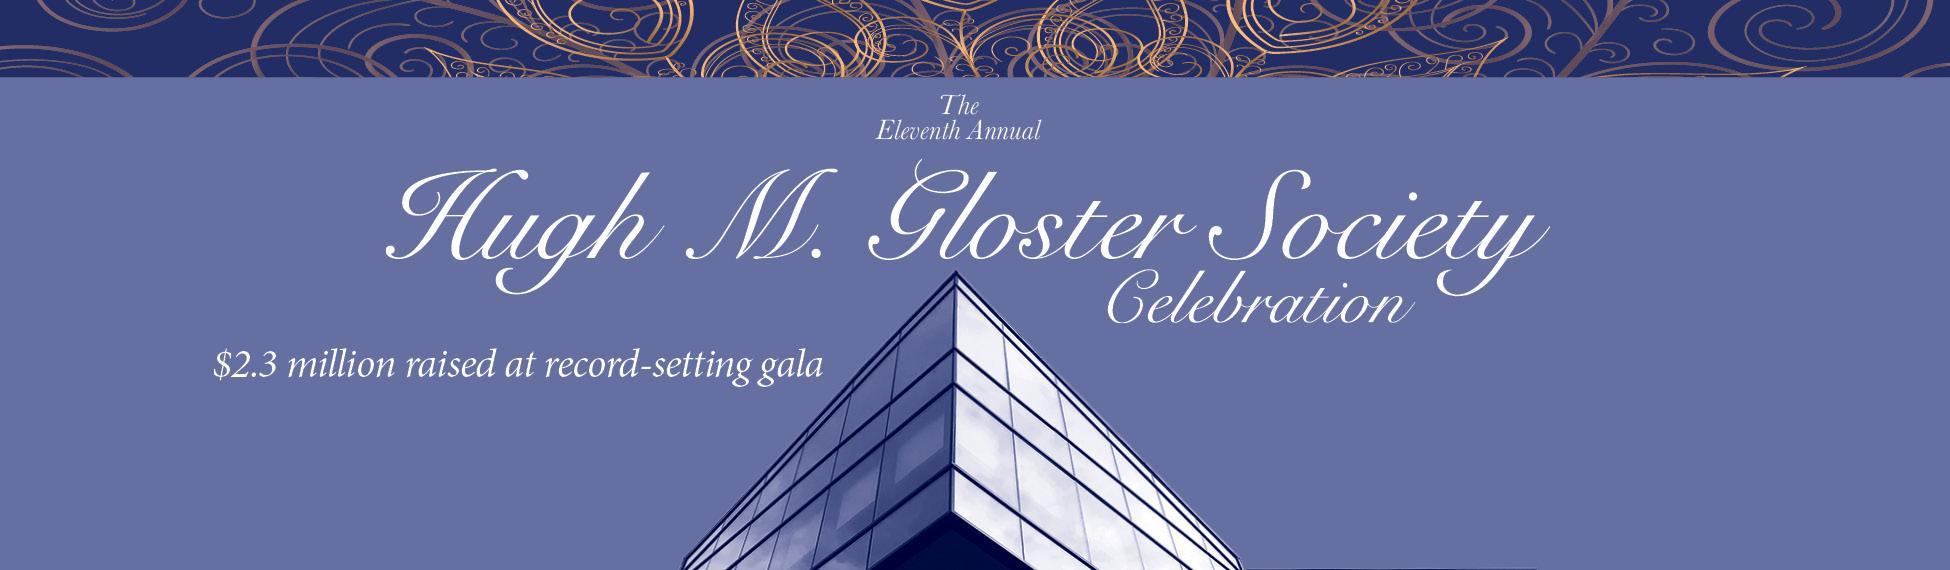 Gloster Society Celebration - $2.3 million raised at record-setting gala